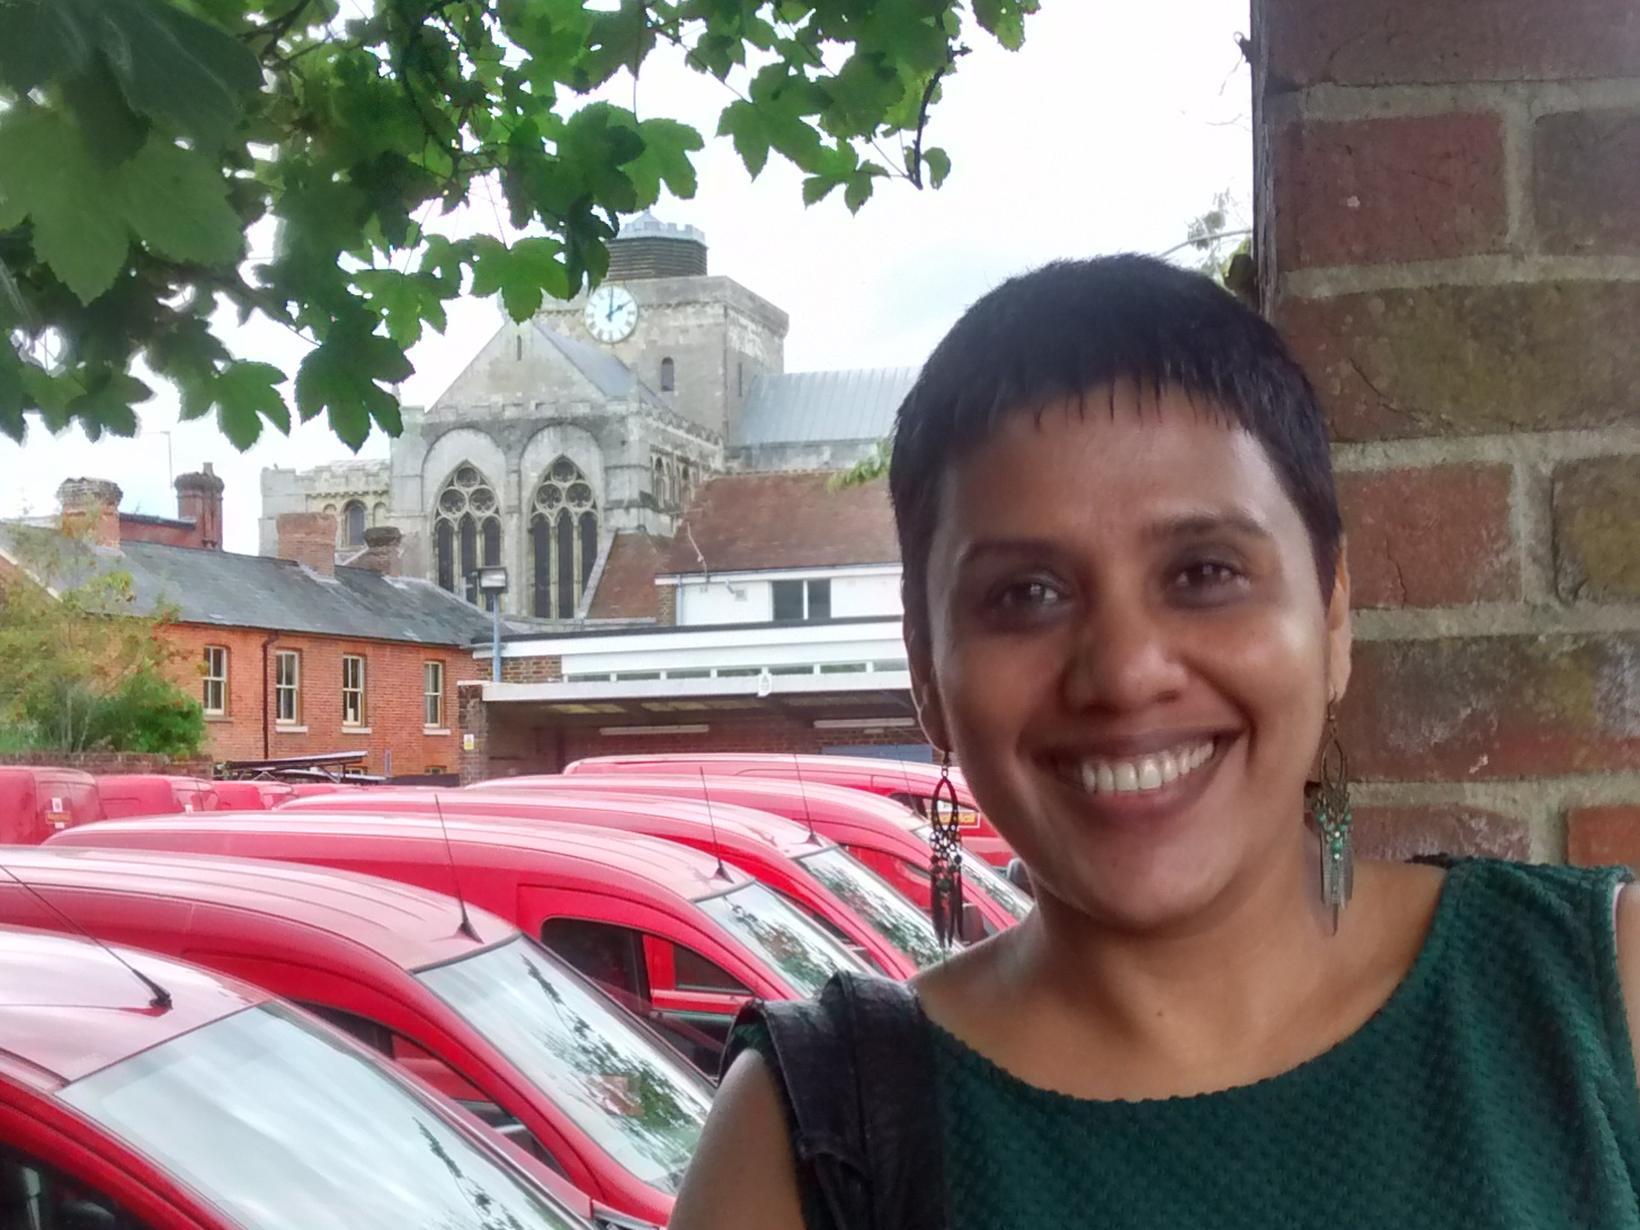 Devyanee from Southampton, United Kingdom